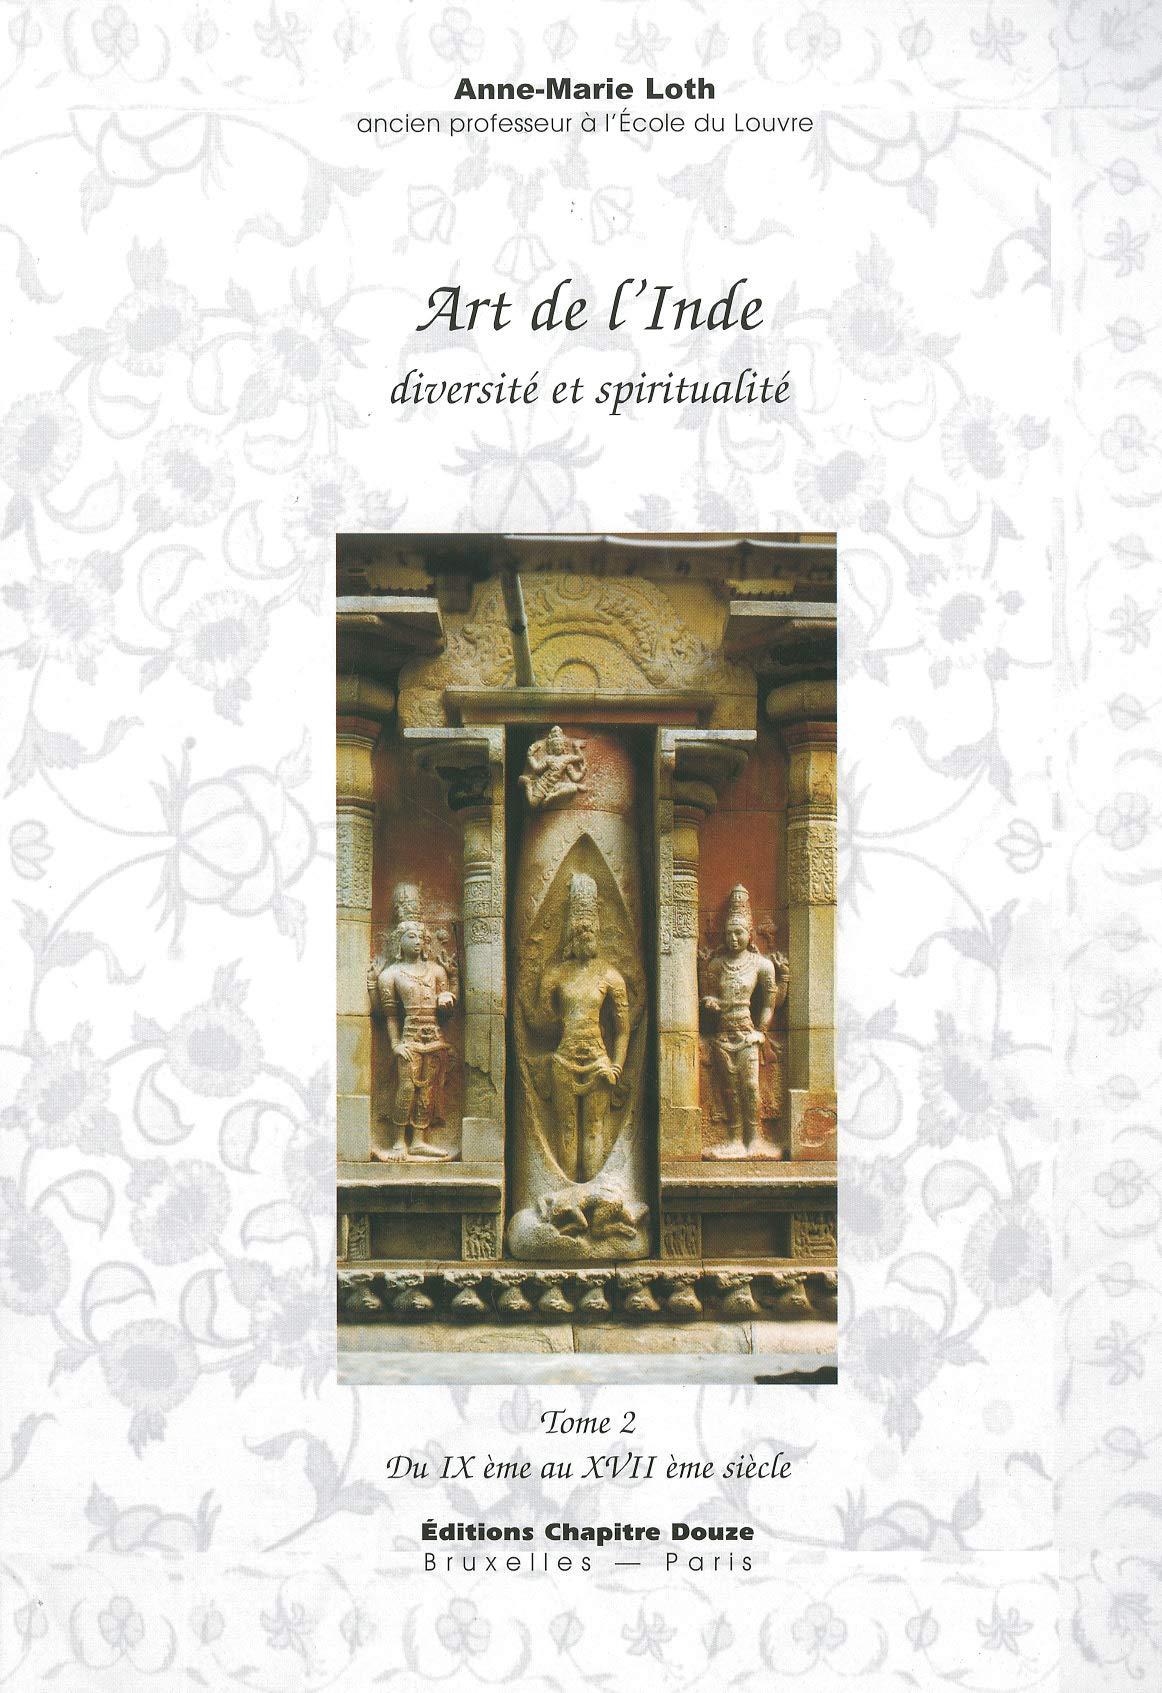 ART DE L INDE VOLUME 2: LOTH ANNE MARI: 9782915345032: Amazon com